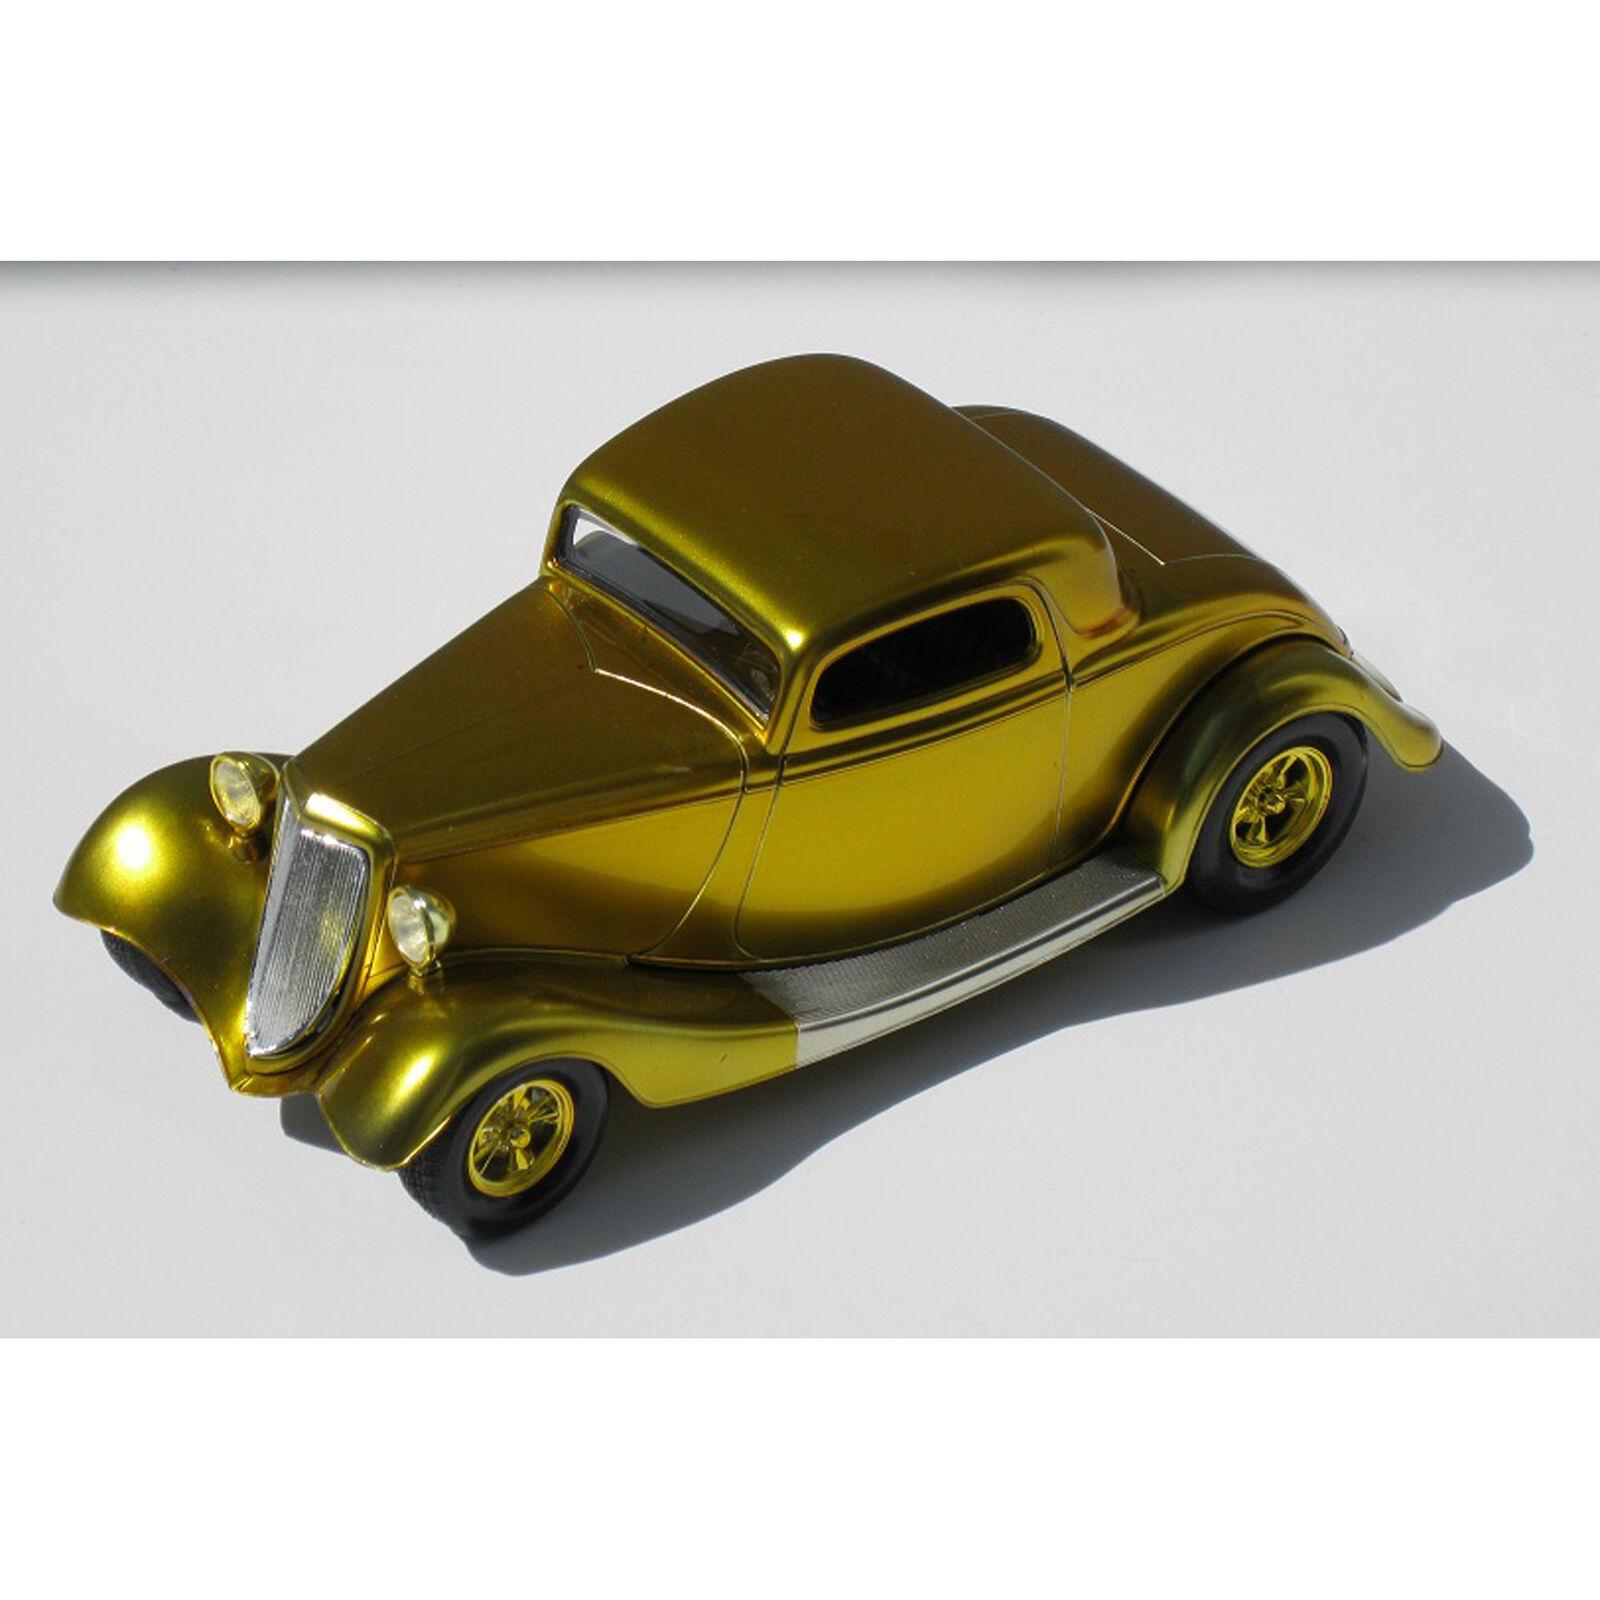 Candy Golden Yellow Enamel, 1oz